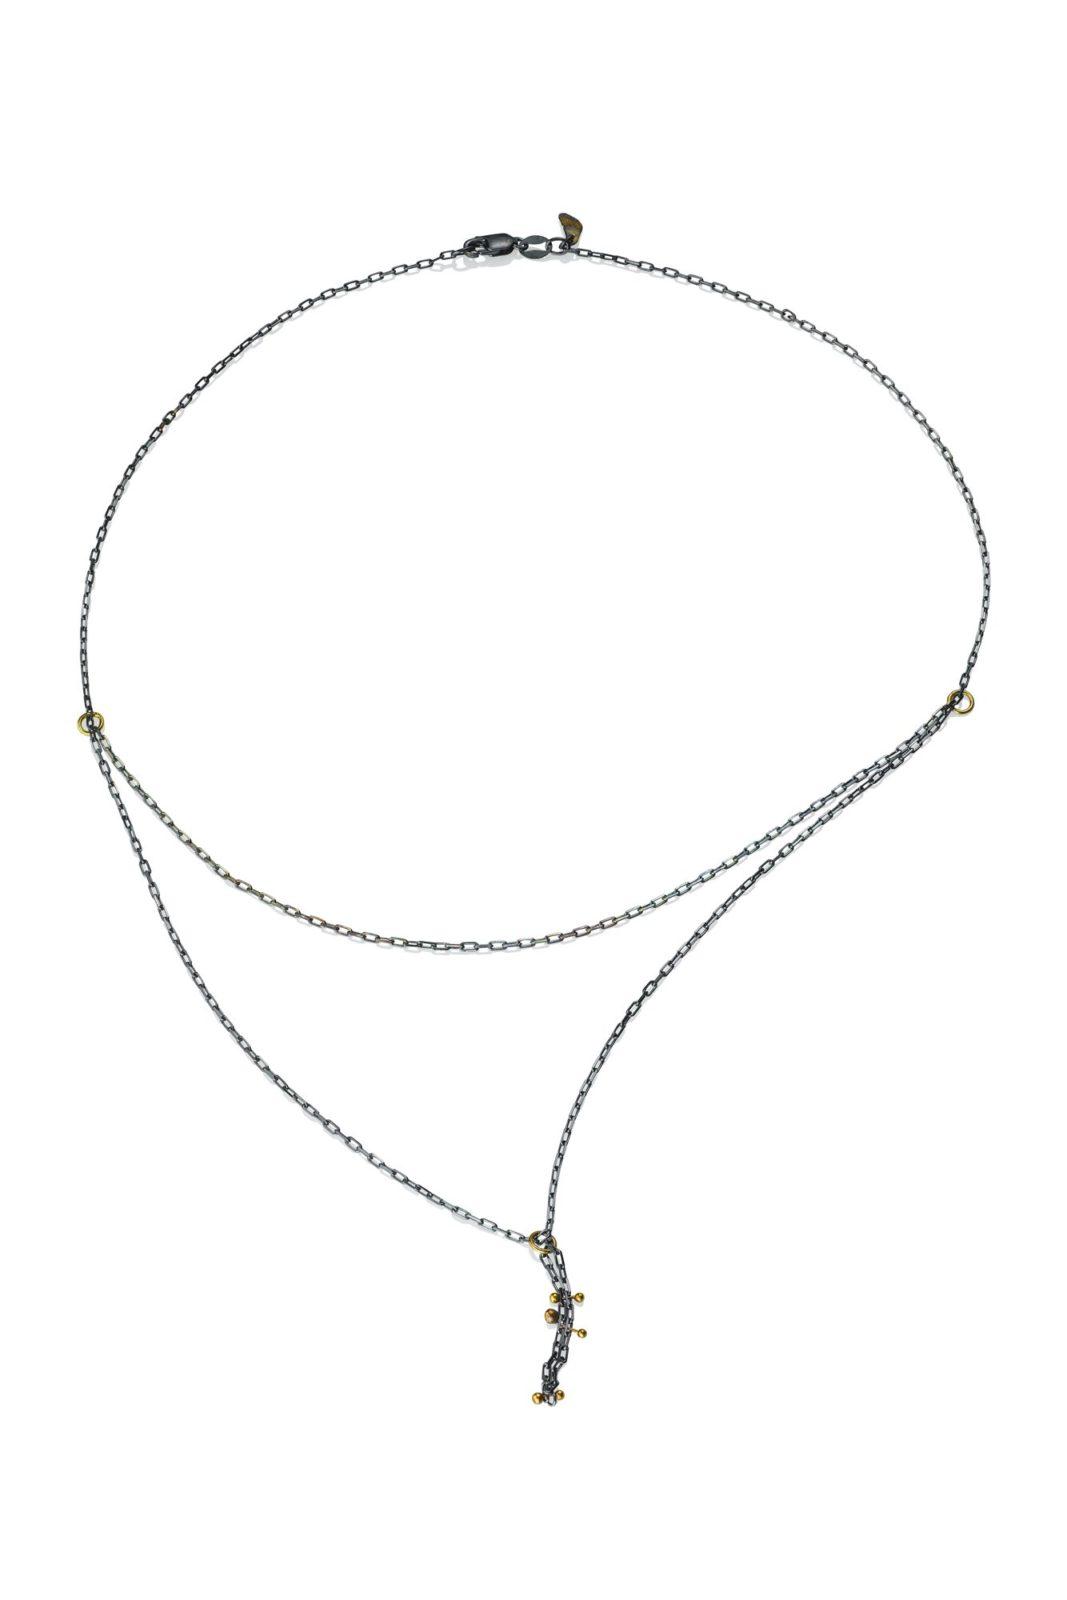 lisa jane grant mokume mixed metal jewelry 18k Yellow gold contemporary necklace organic Maine handmade unique jewellery pendant/ necklace oxidized oxidised